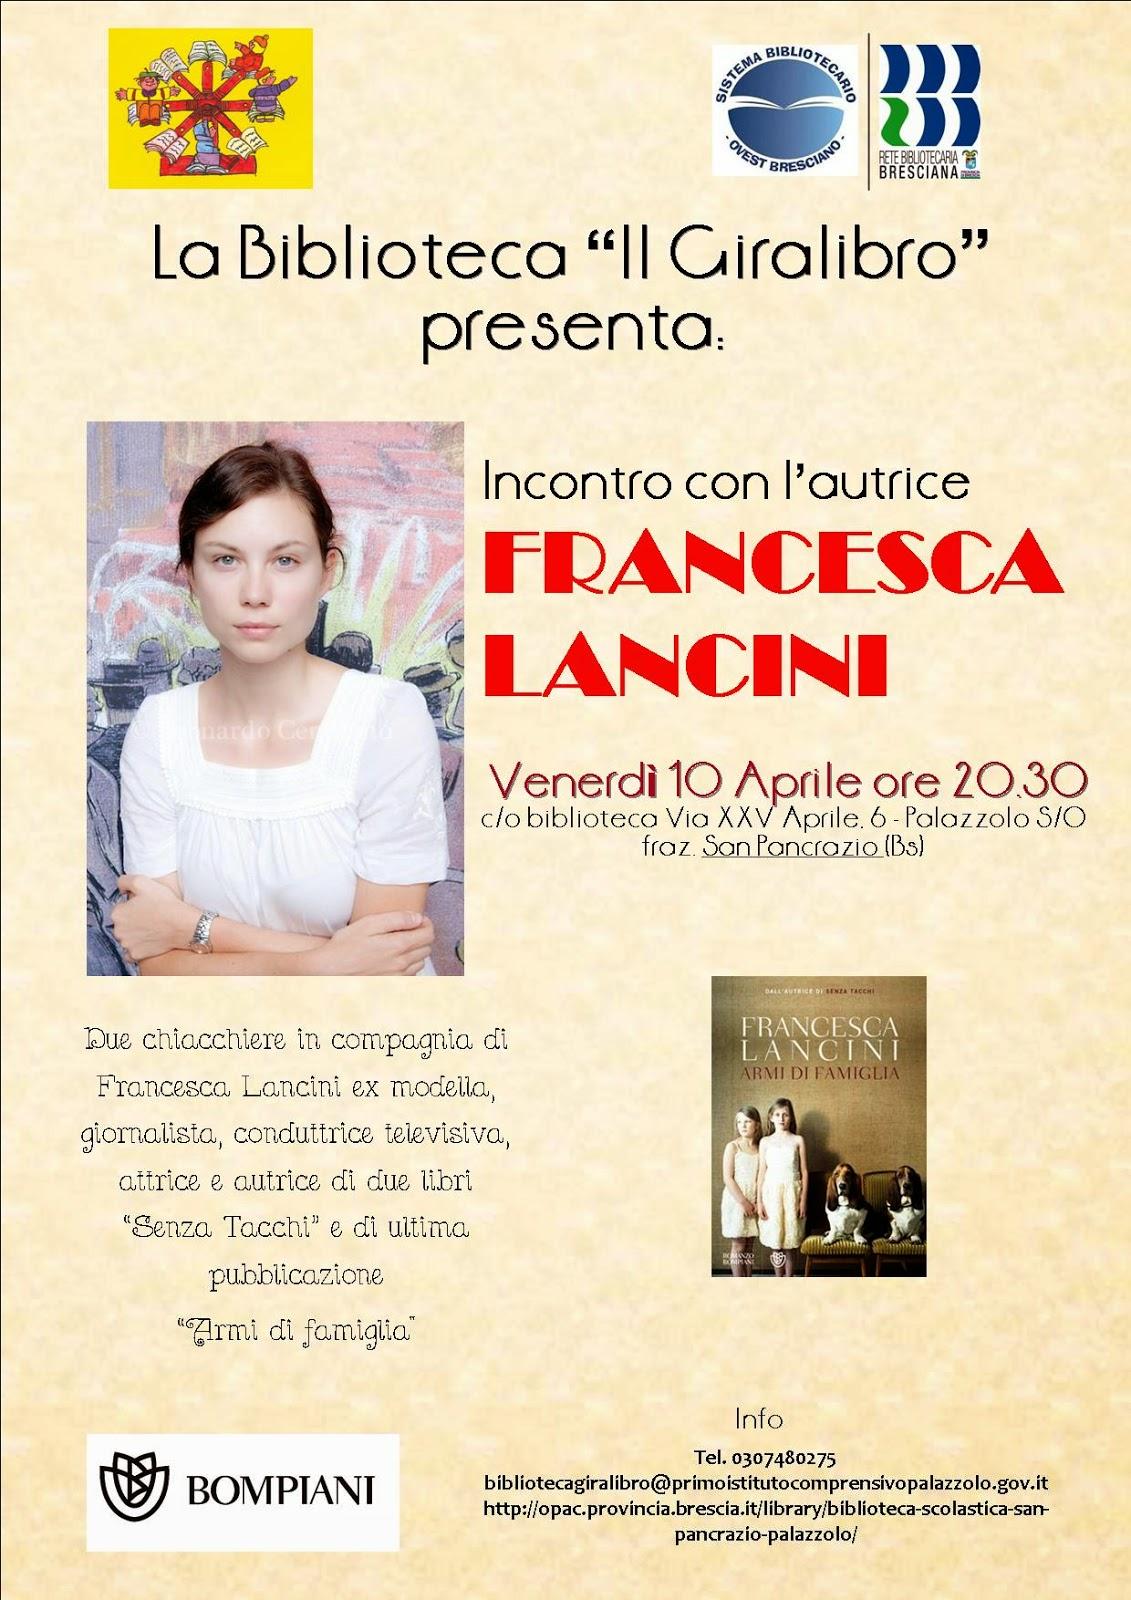 Incontro con l'autrice : Francesca Lancini